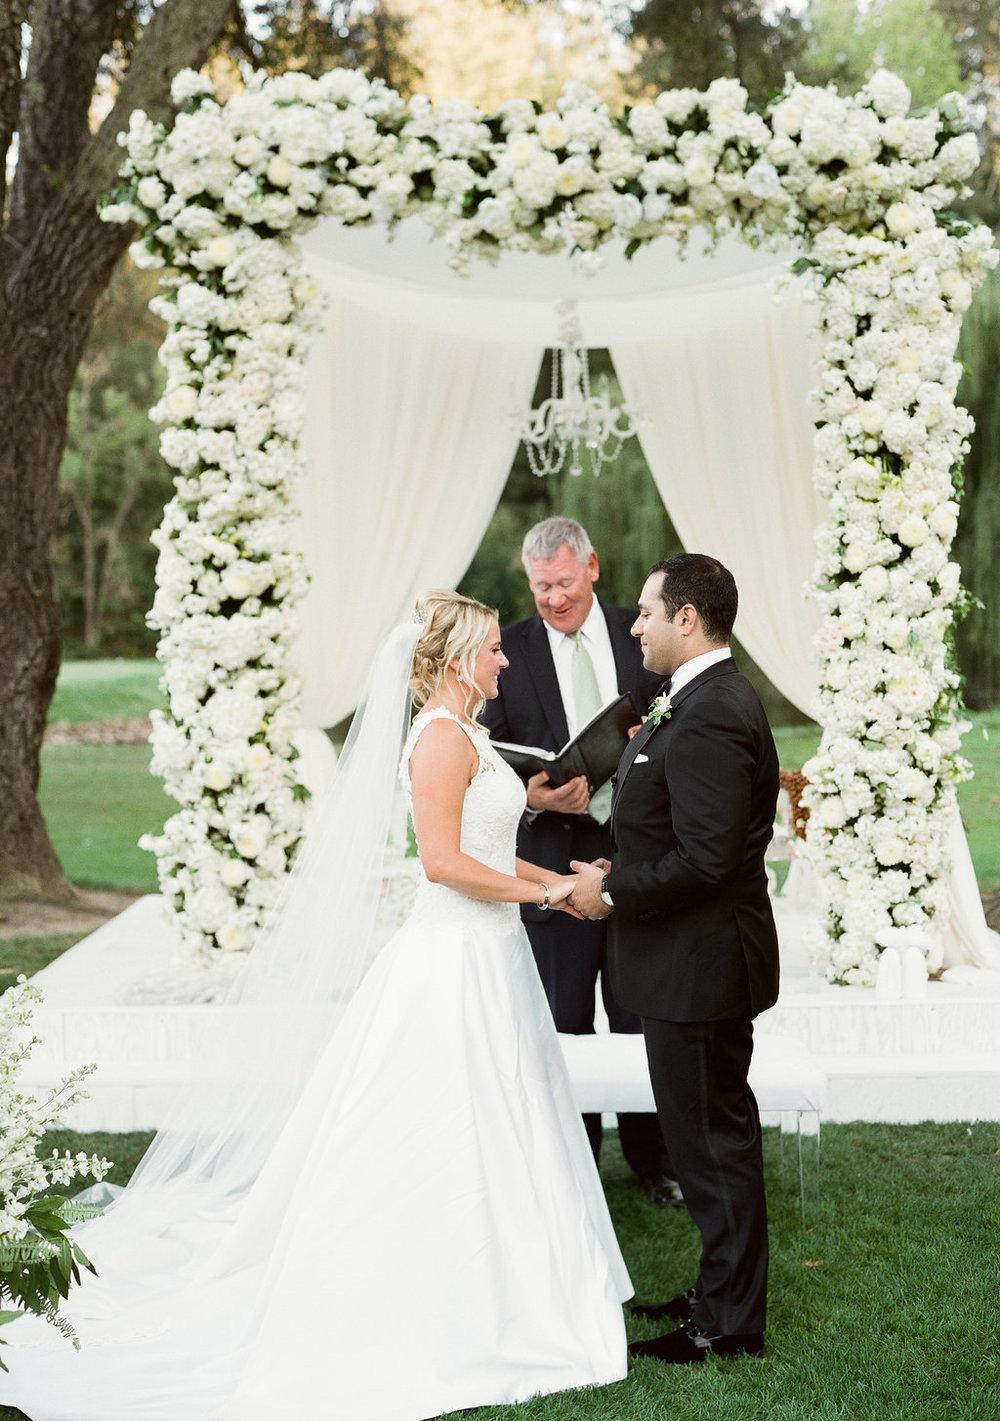 Katlin&Nawder-Ceremony-LindsayMaddenPhotography-85.jpg